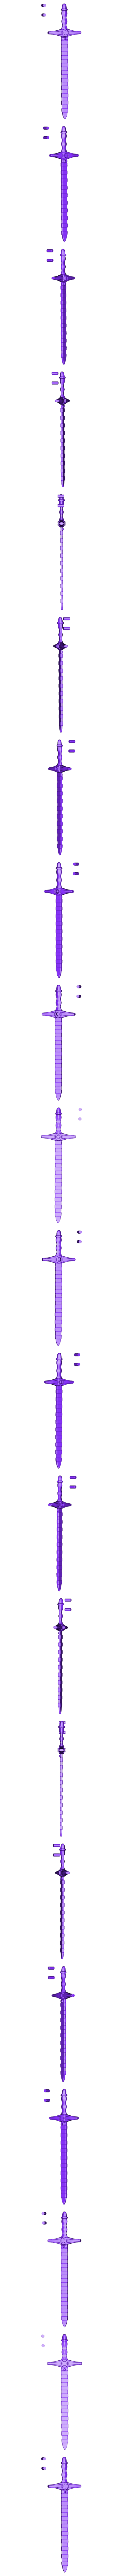 Sword.stl Download free STL file War Horse • 3D printable model, Double_Alfa_3D